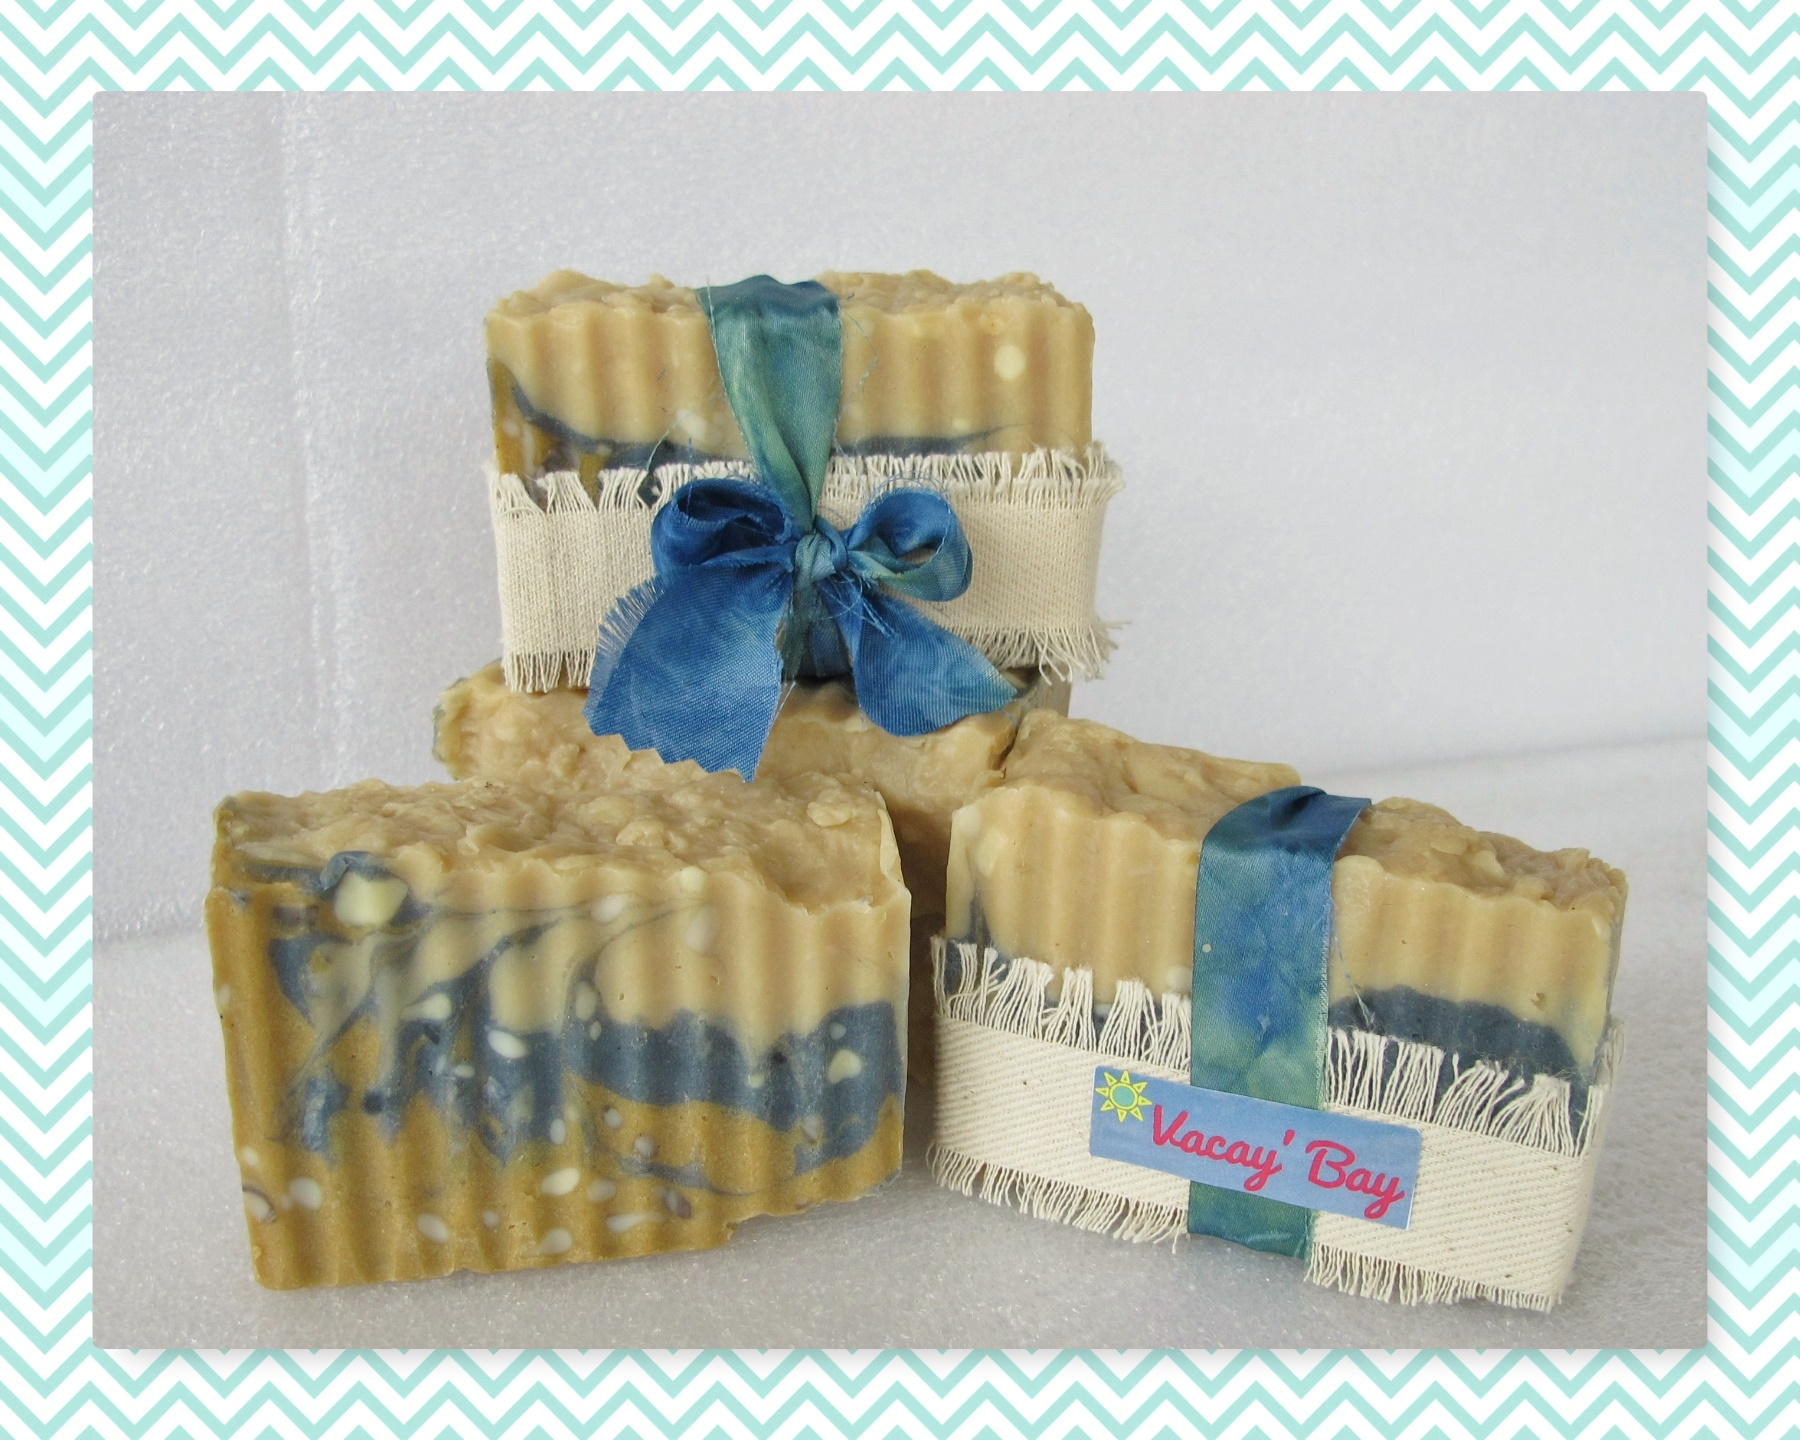 vacay bay mens rustic soap